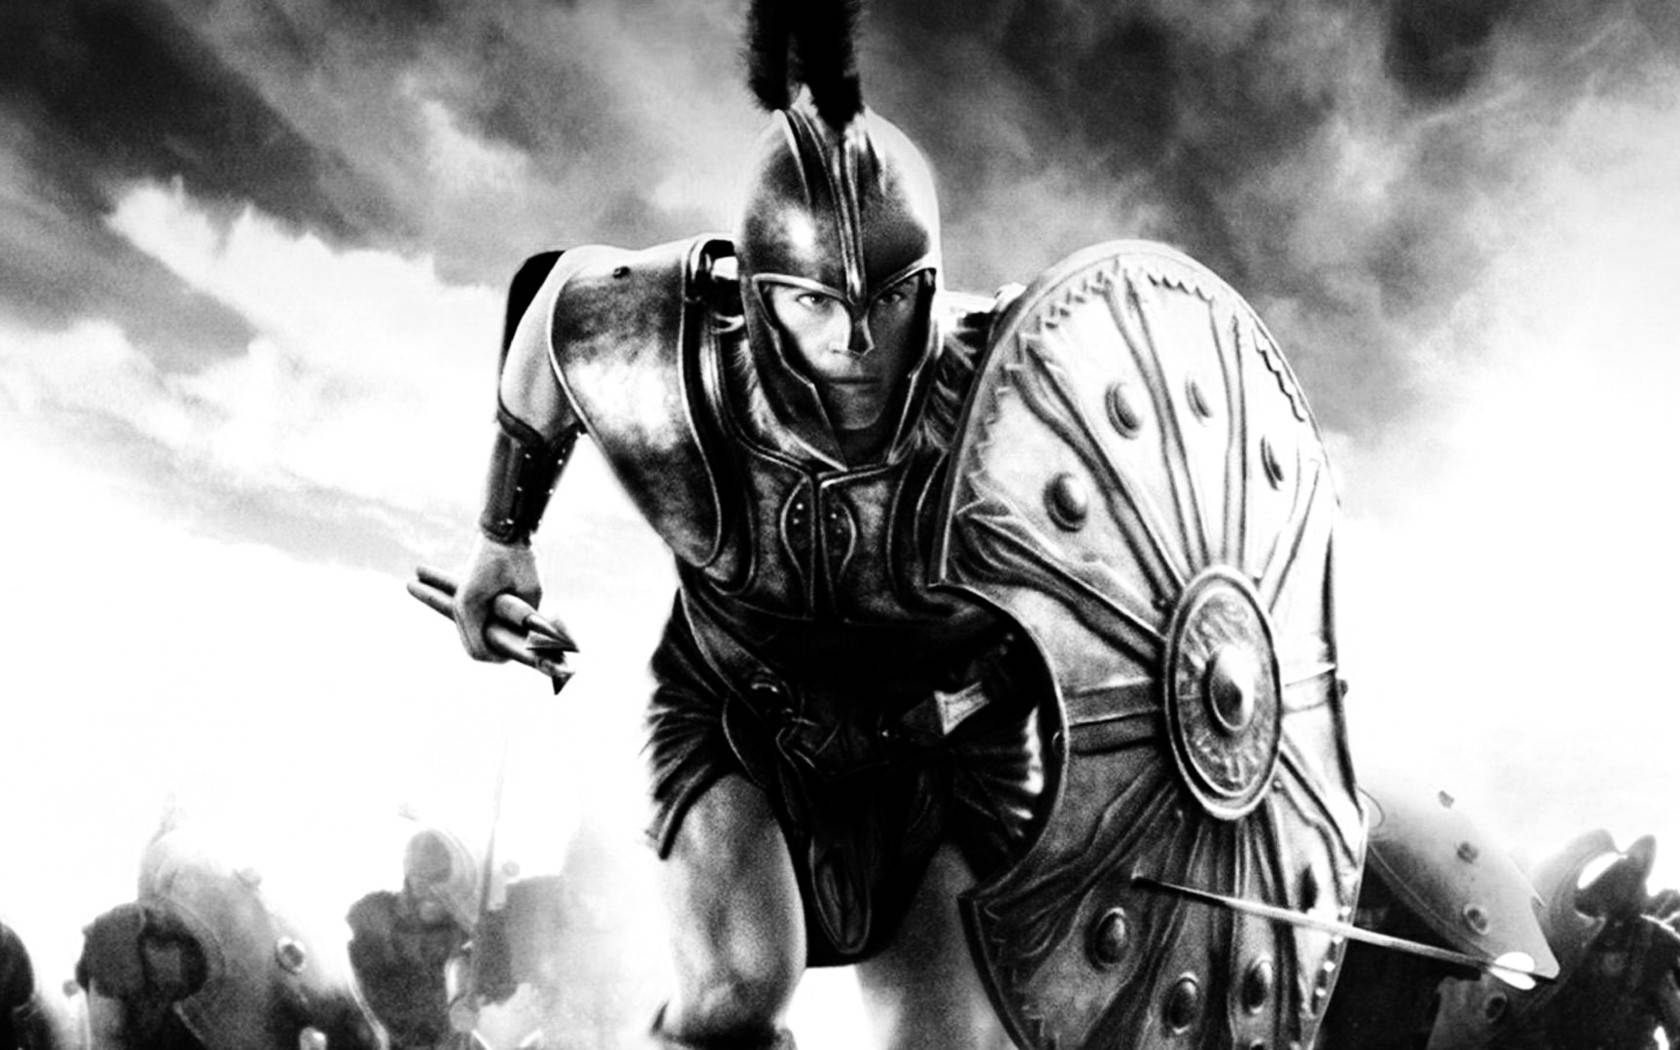 spartan warrior wallpapers - wallpaper cave